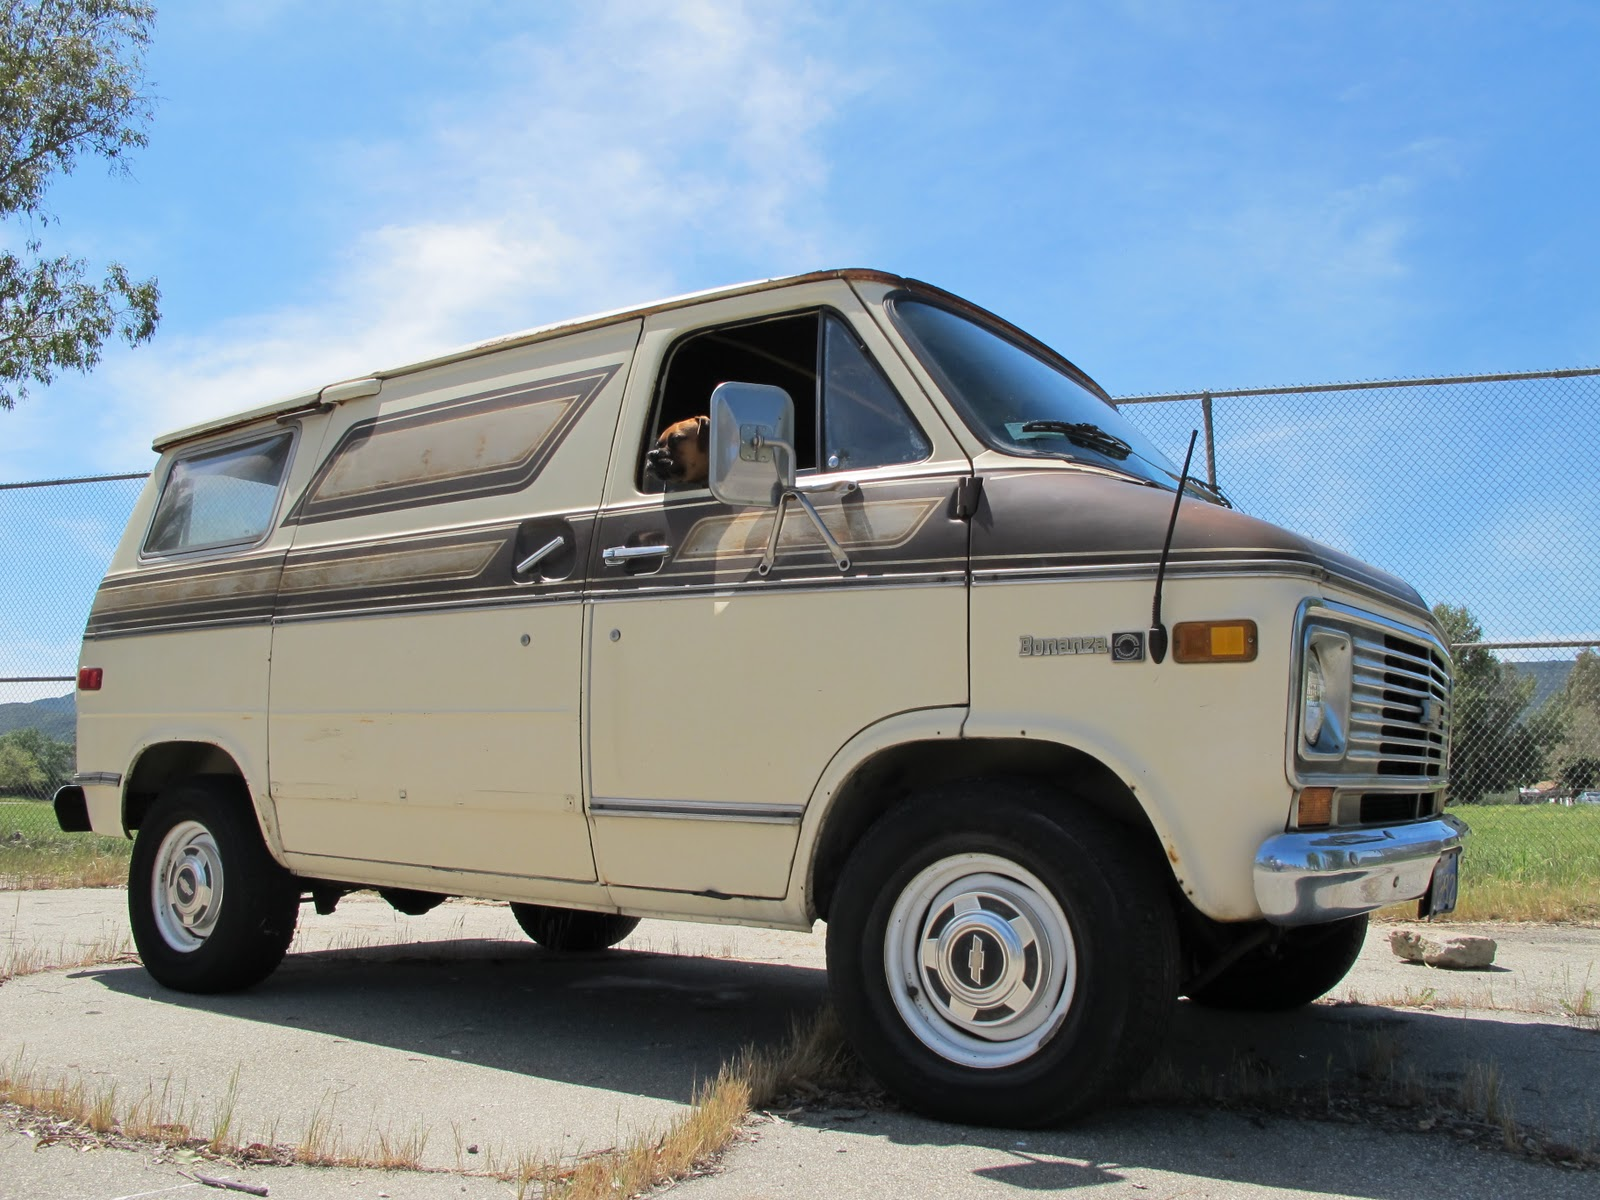 Chevy Shorty Craigslist Van